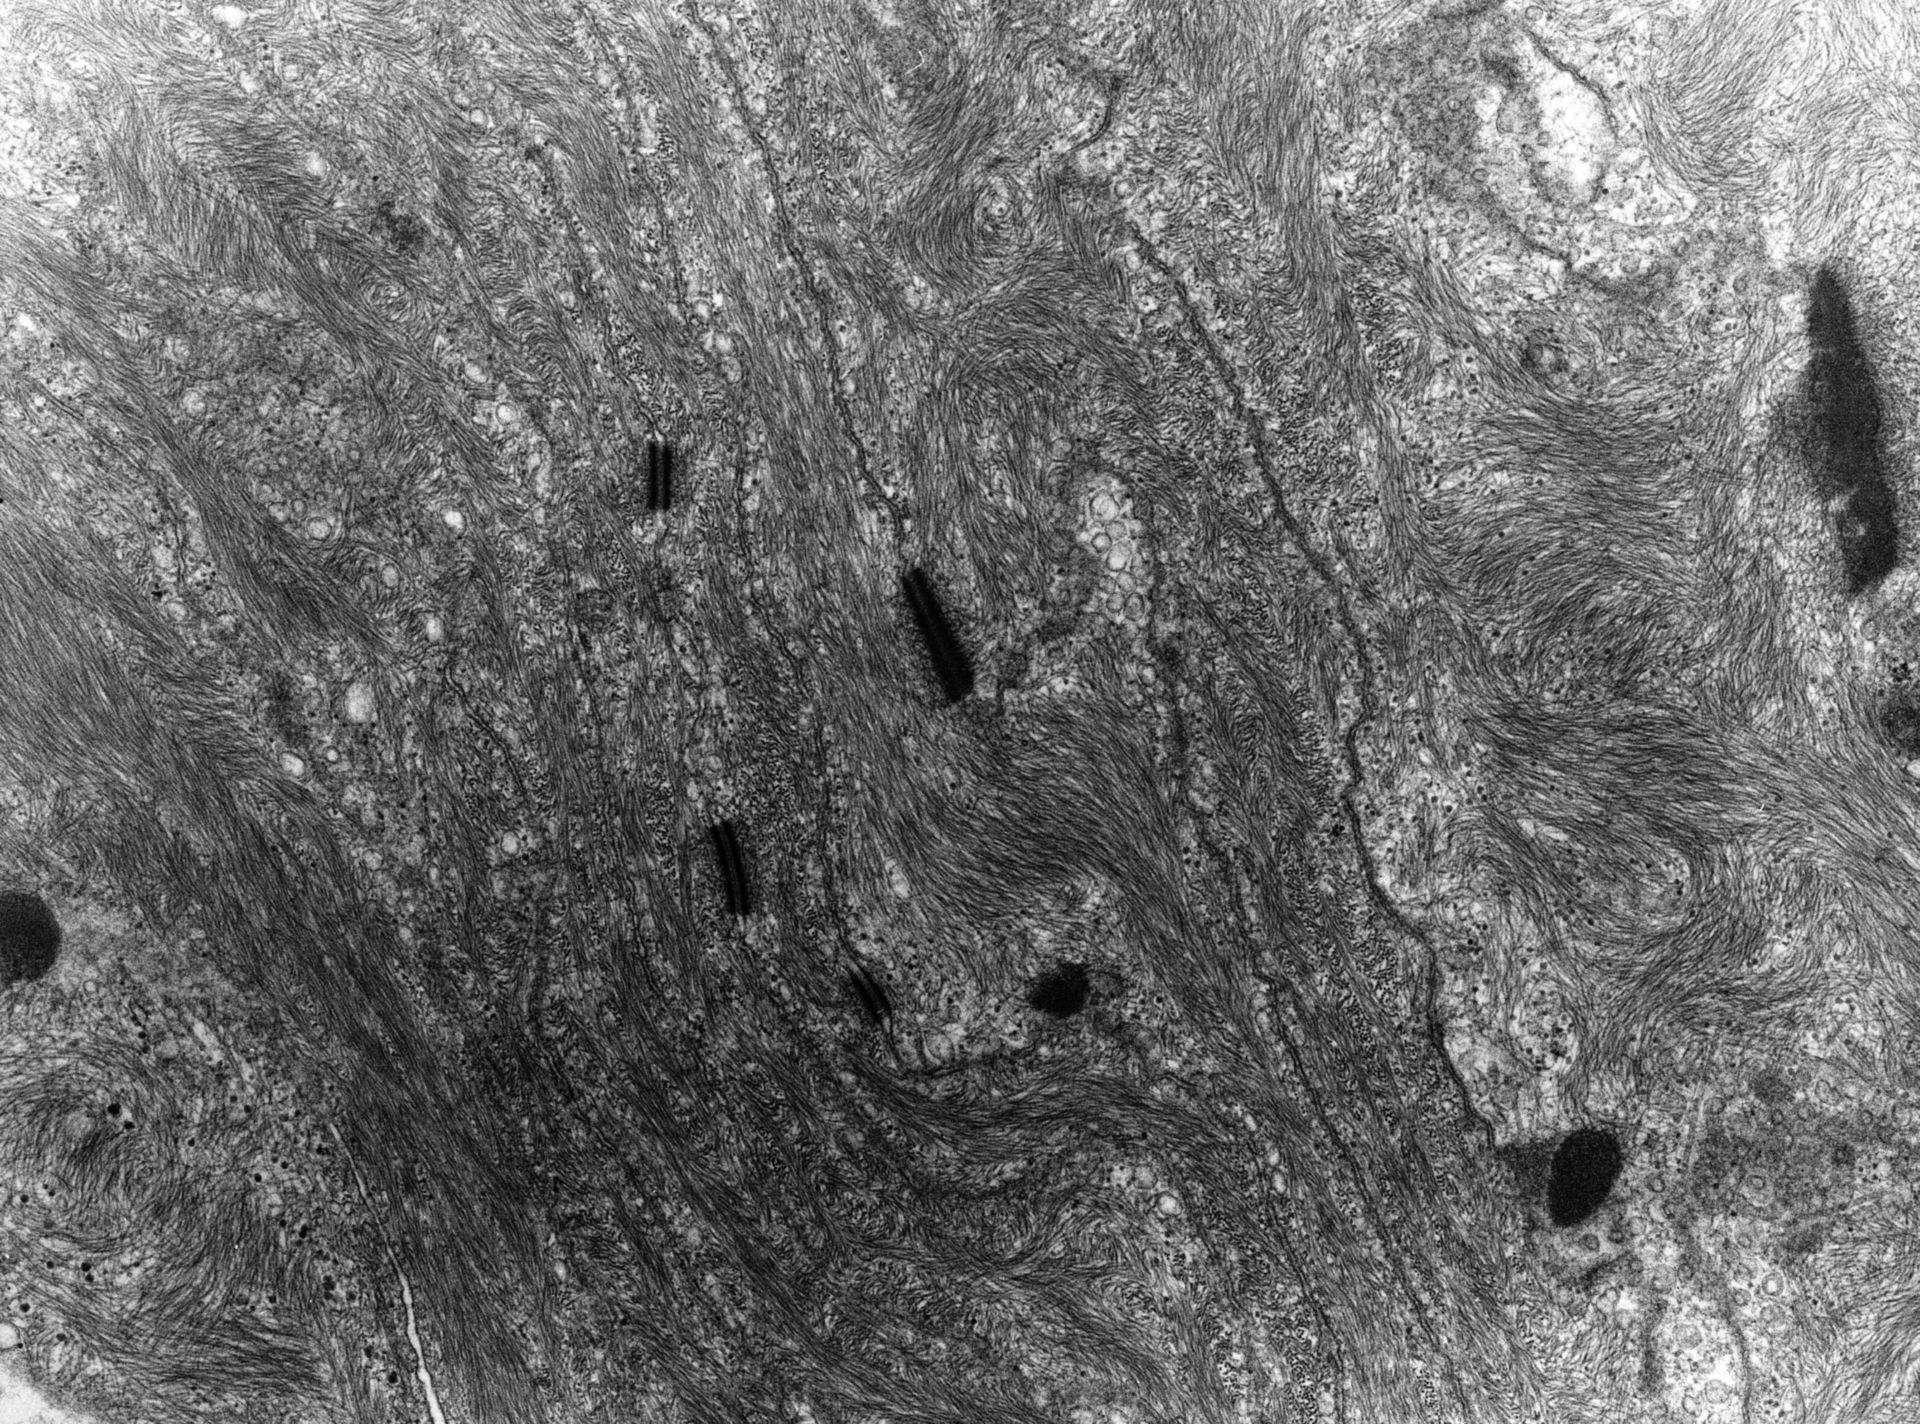 Rana catesbeiana (Plasma membrane) - CIL:9302